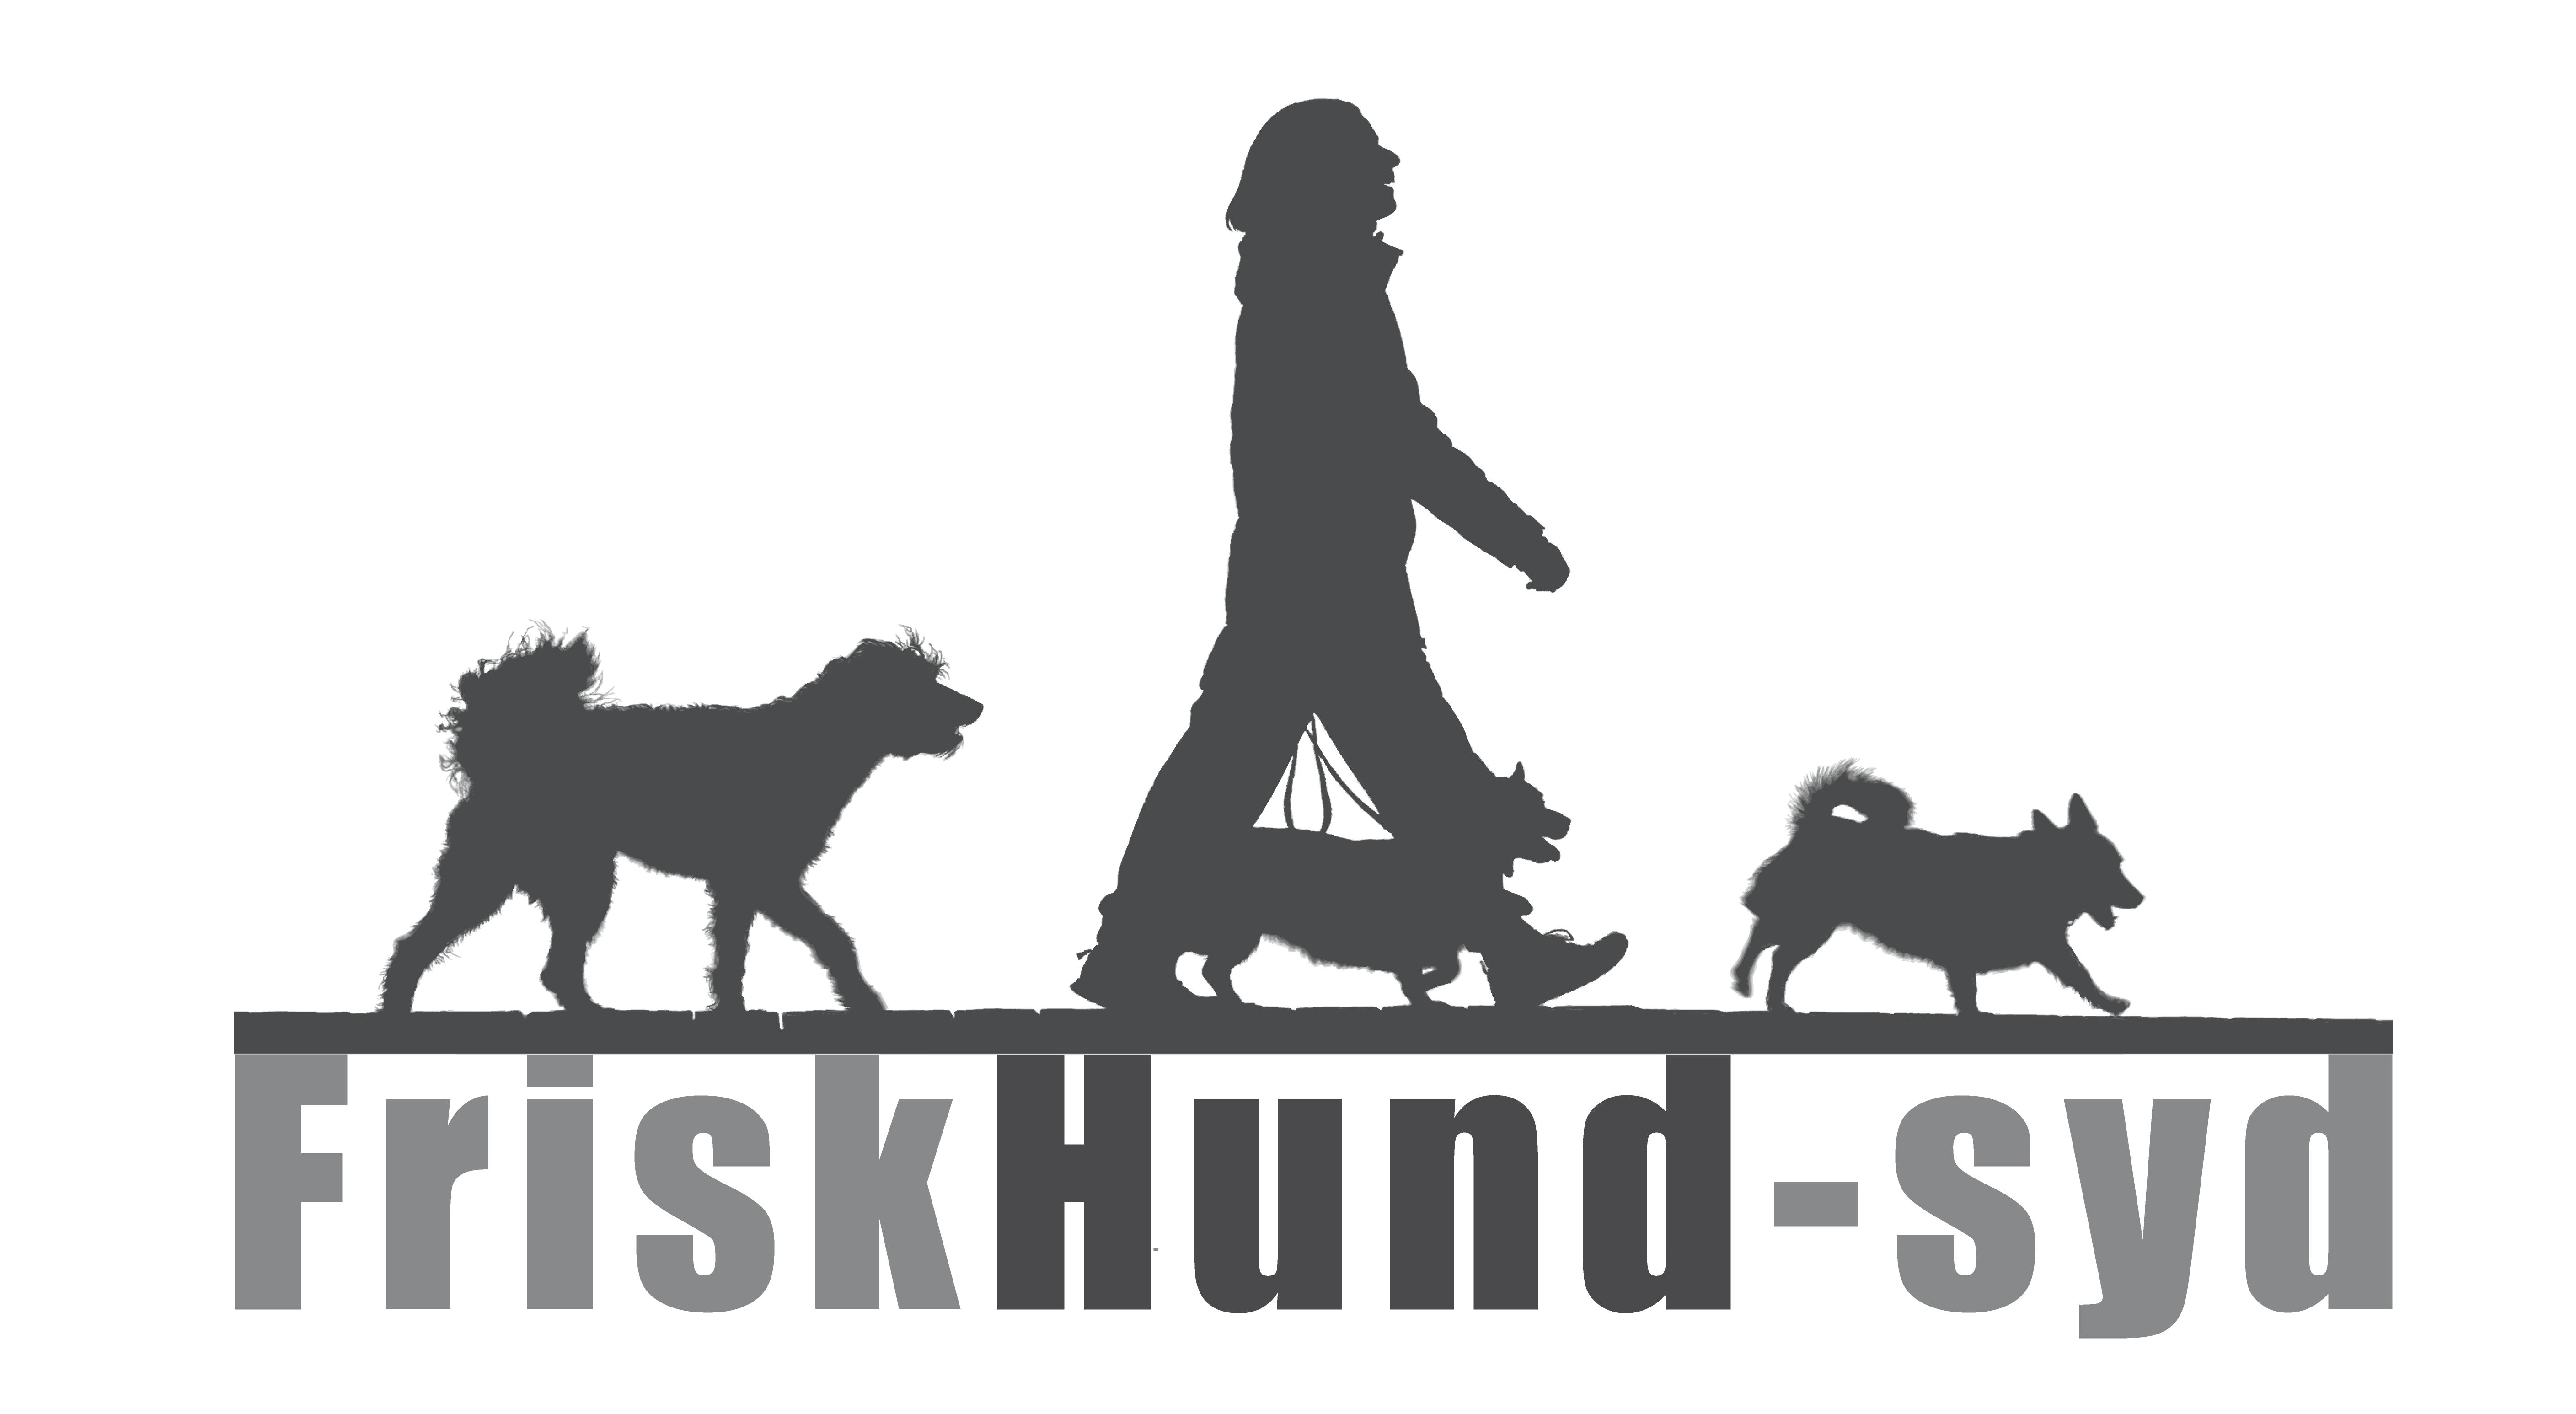 FriskHund-syd